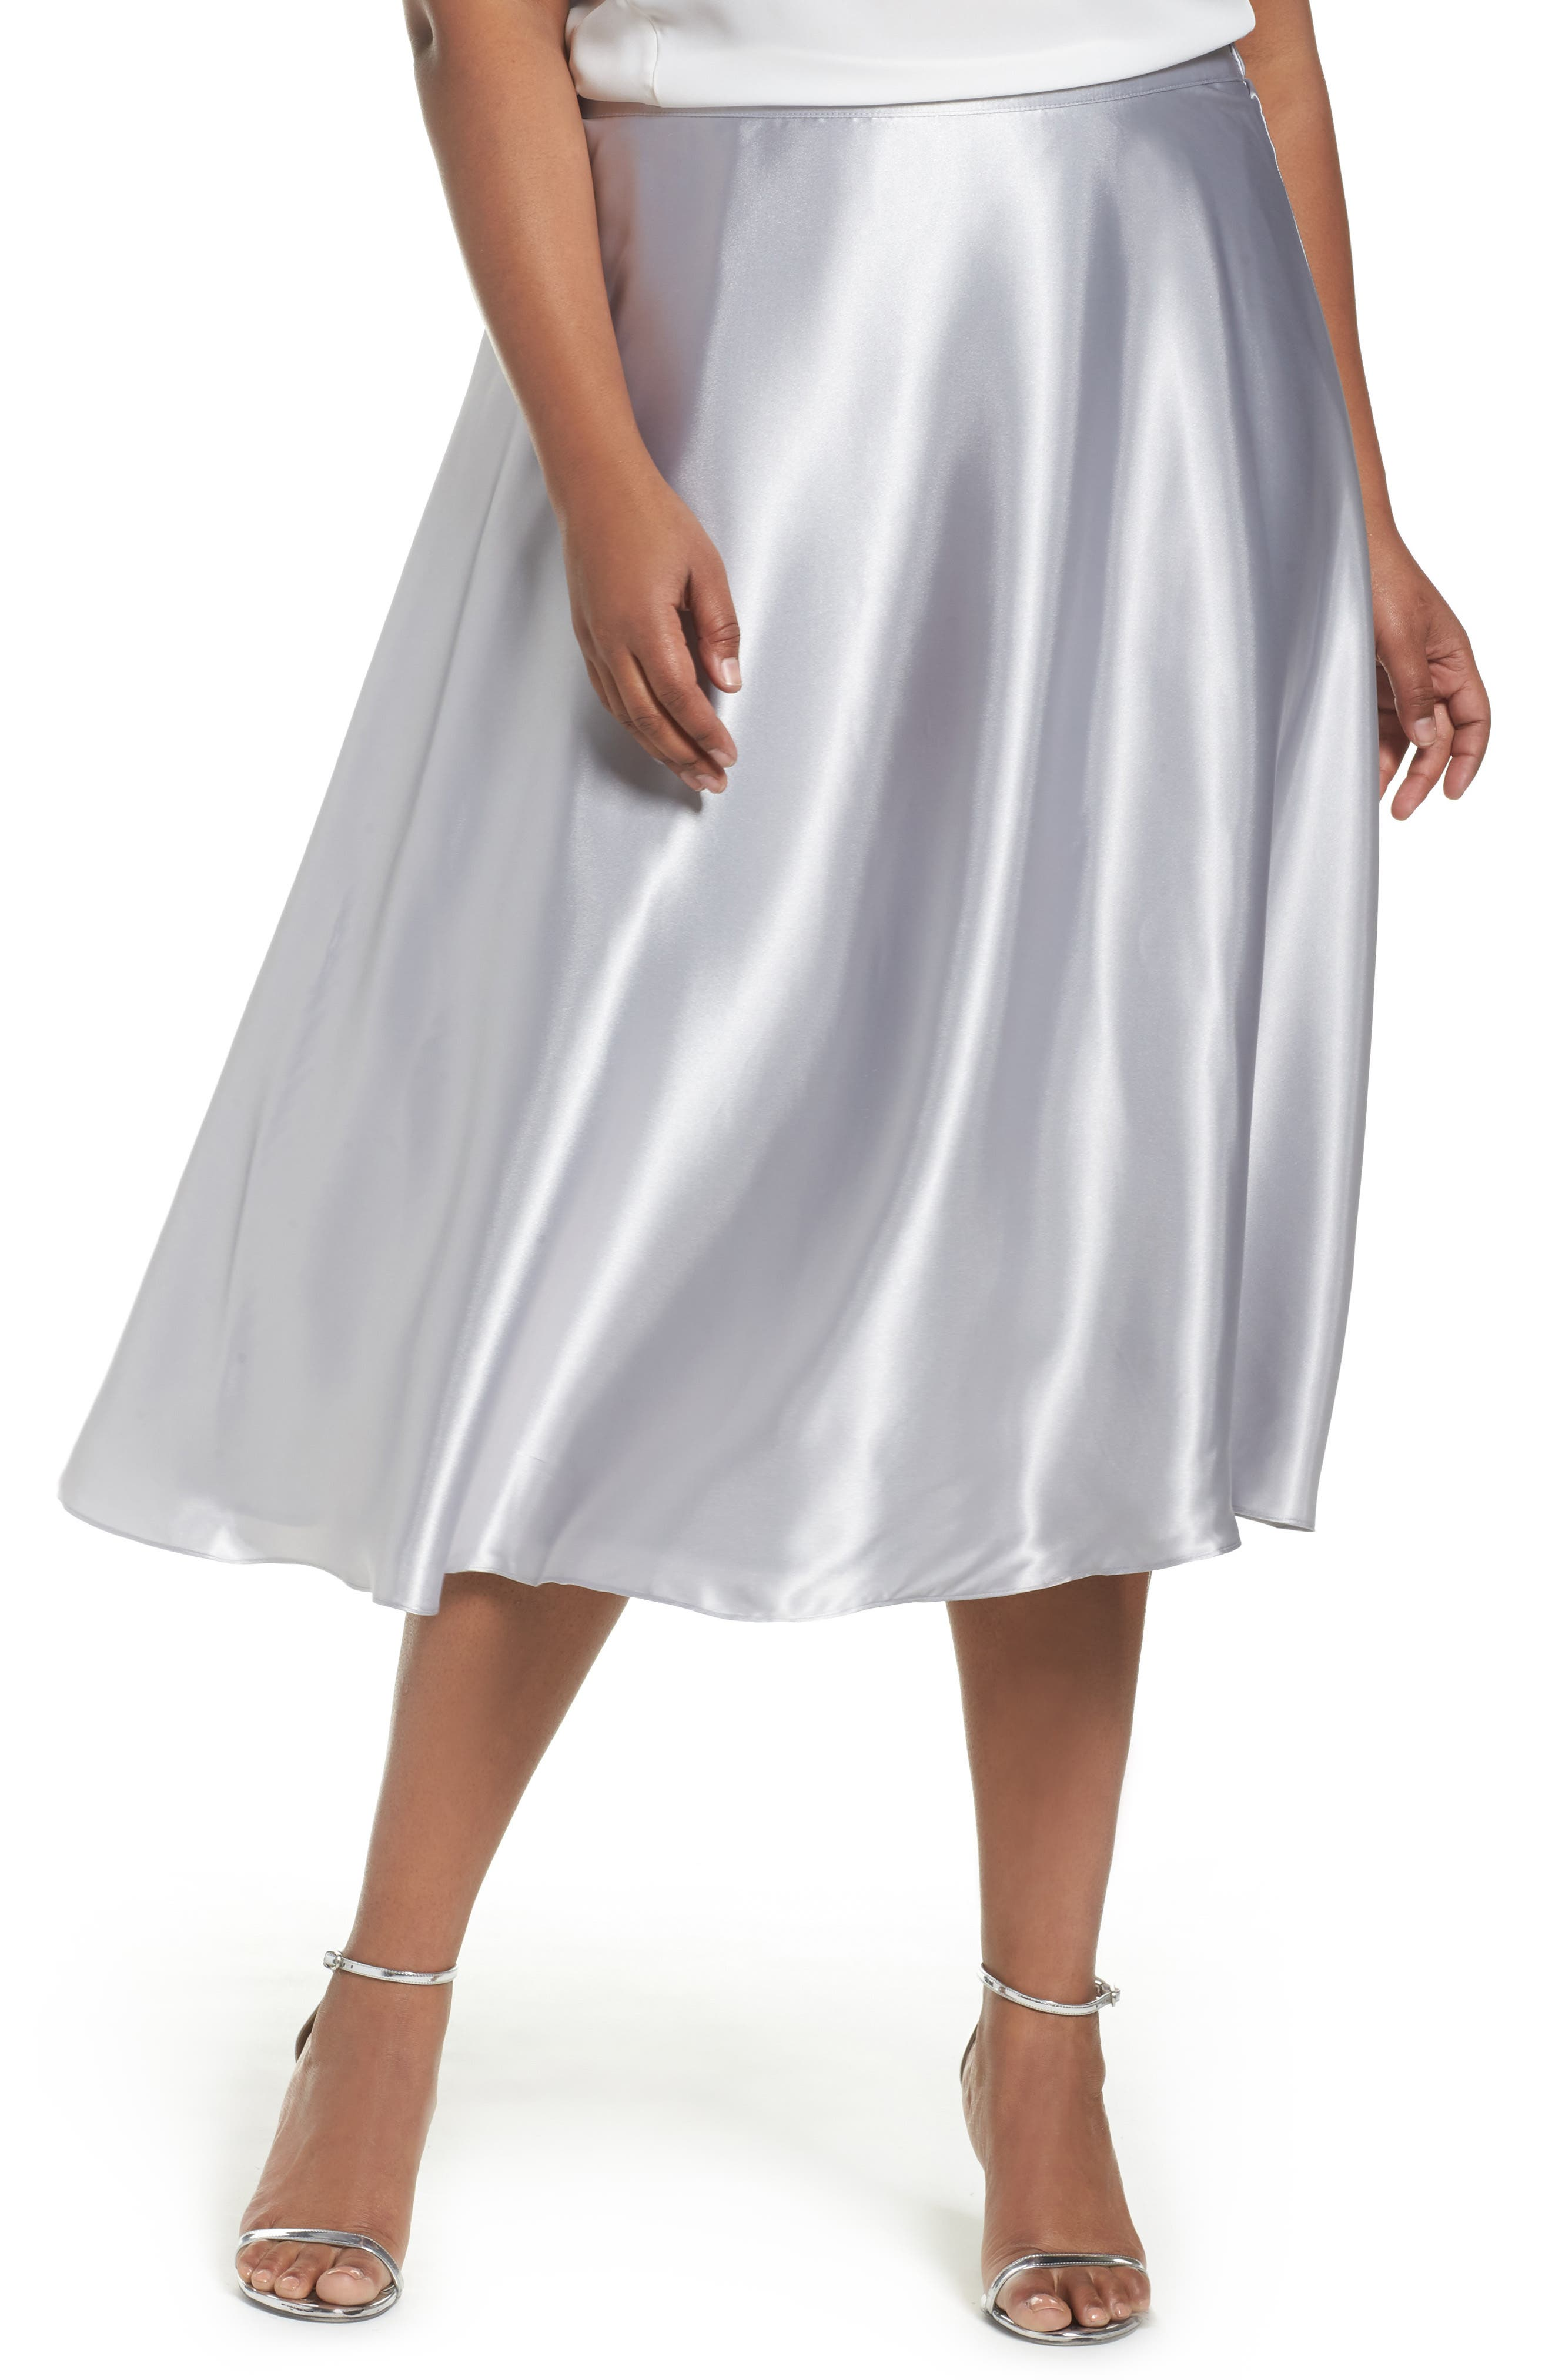 Alternate Image 1 Selected - Alex Evenings Full Charmeuse Tea-Length Skirt (Plus Size)